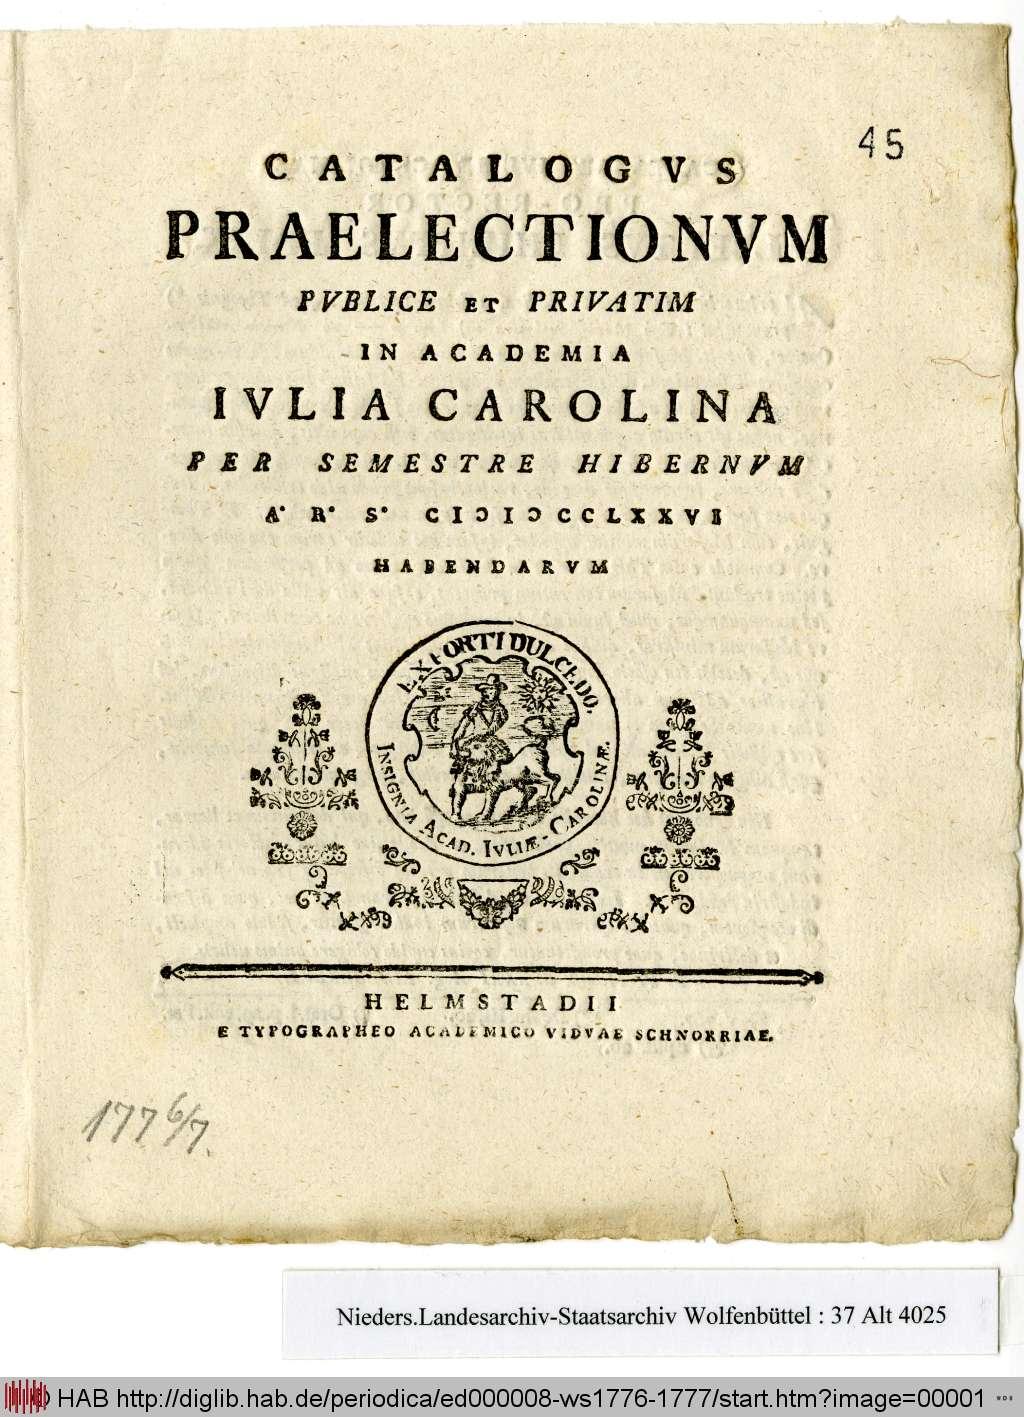 https://diglib.hab.de/periodica/ed000008-ws1776-1777/00001.jpg